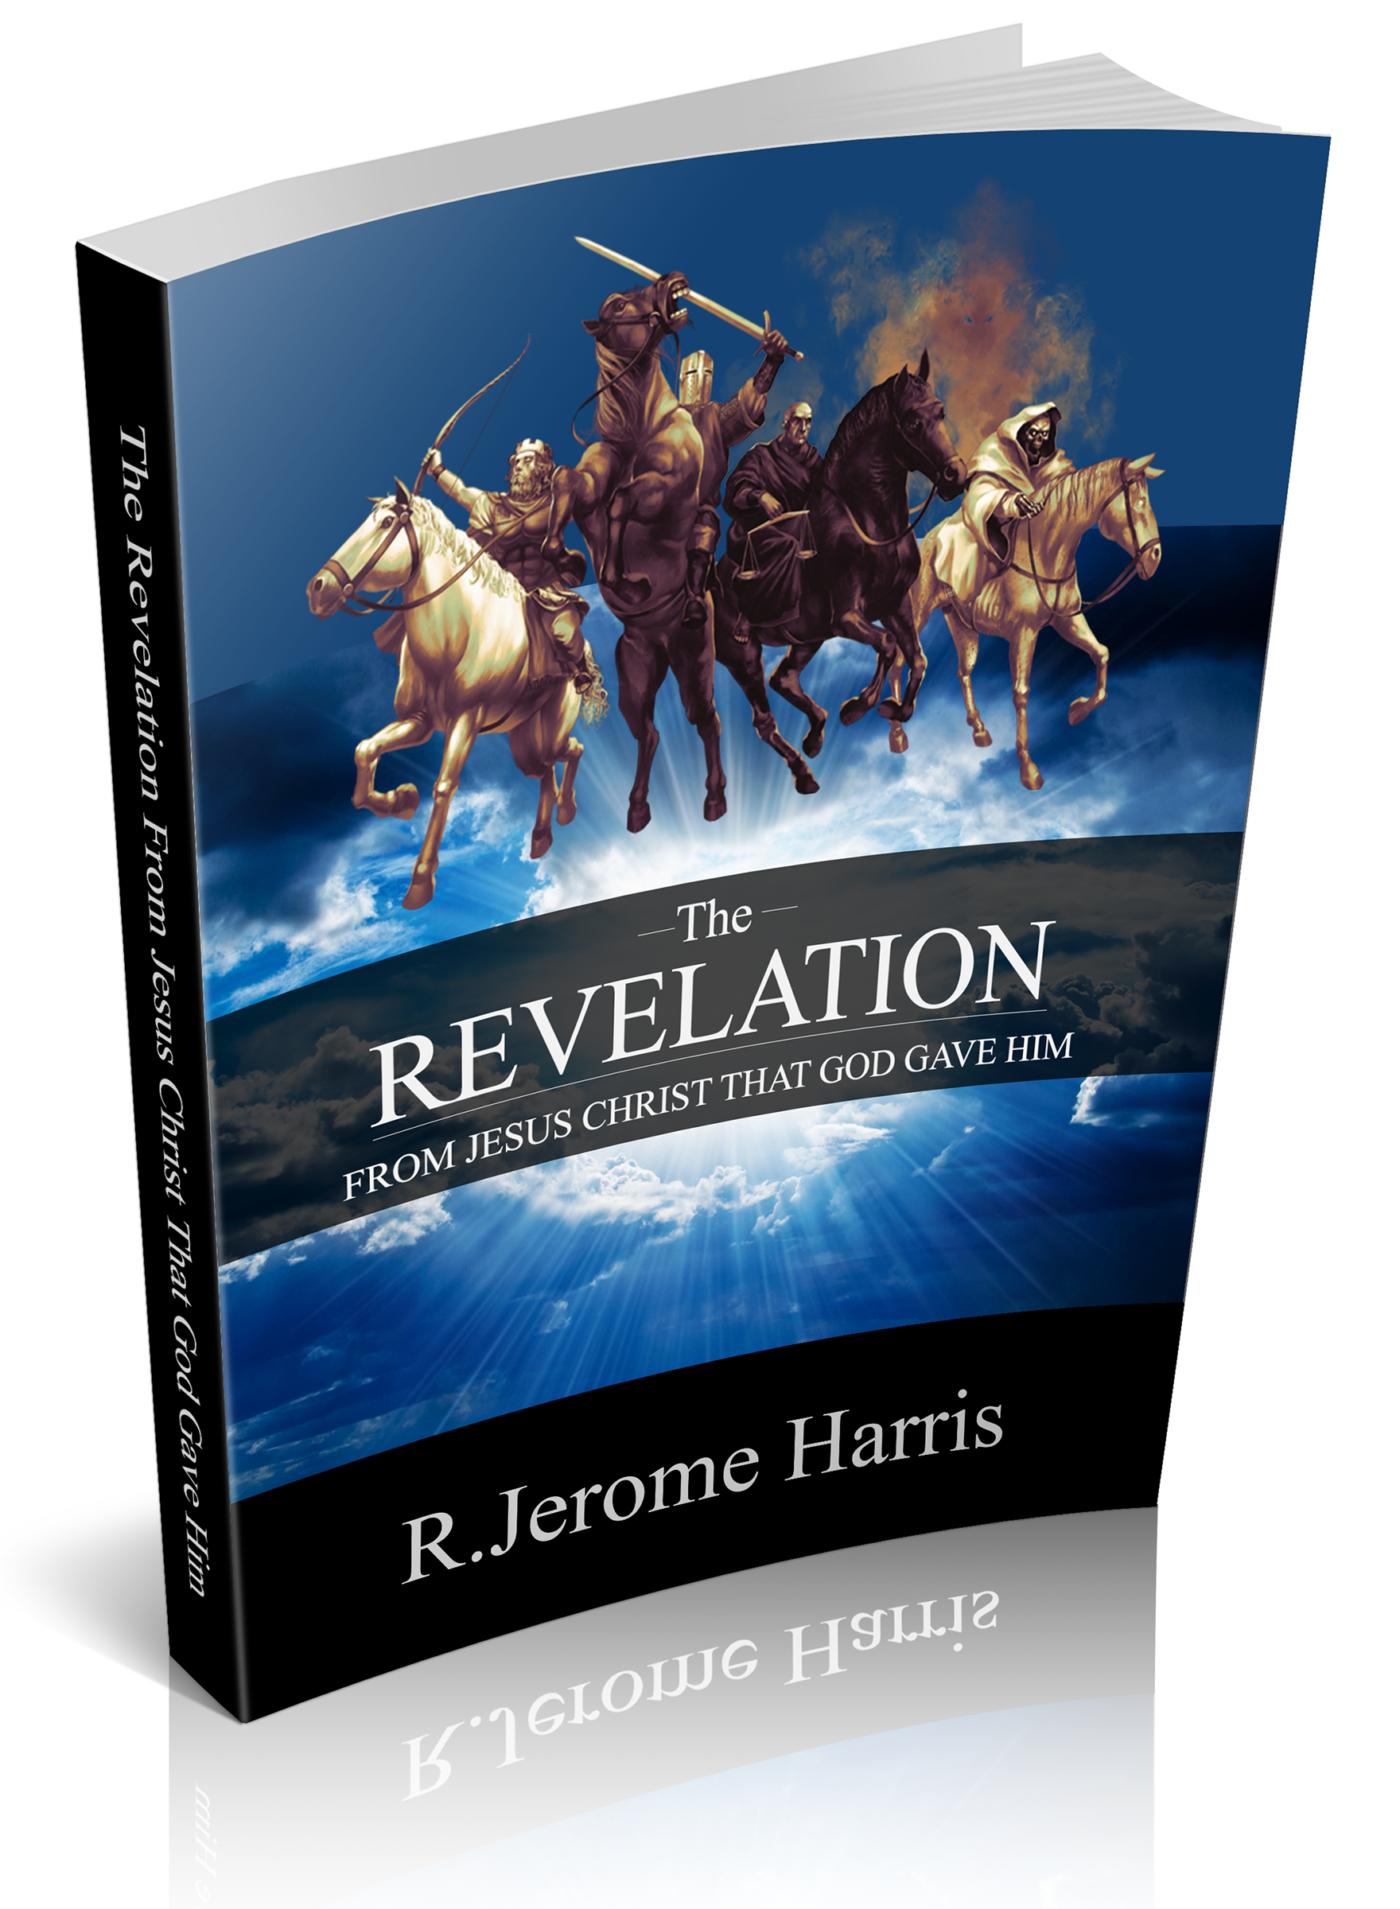 The Revelation From Jesus Christ That God Dave Him